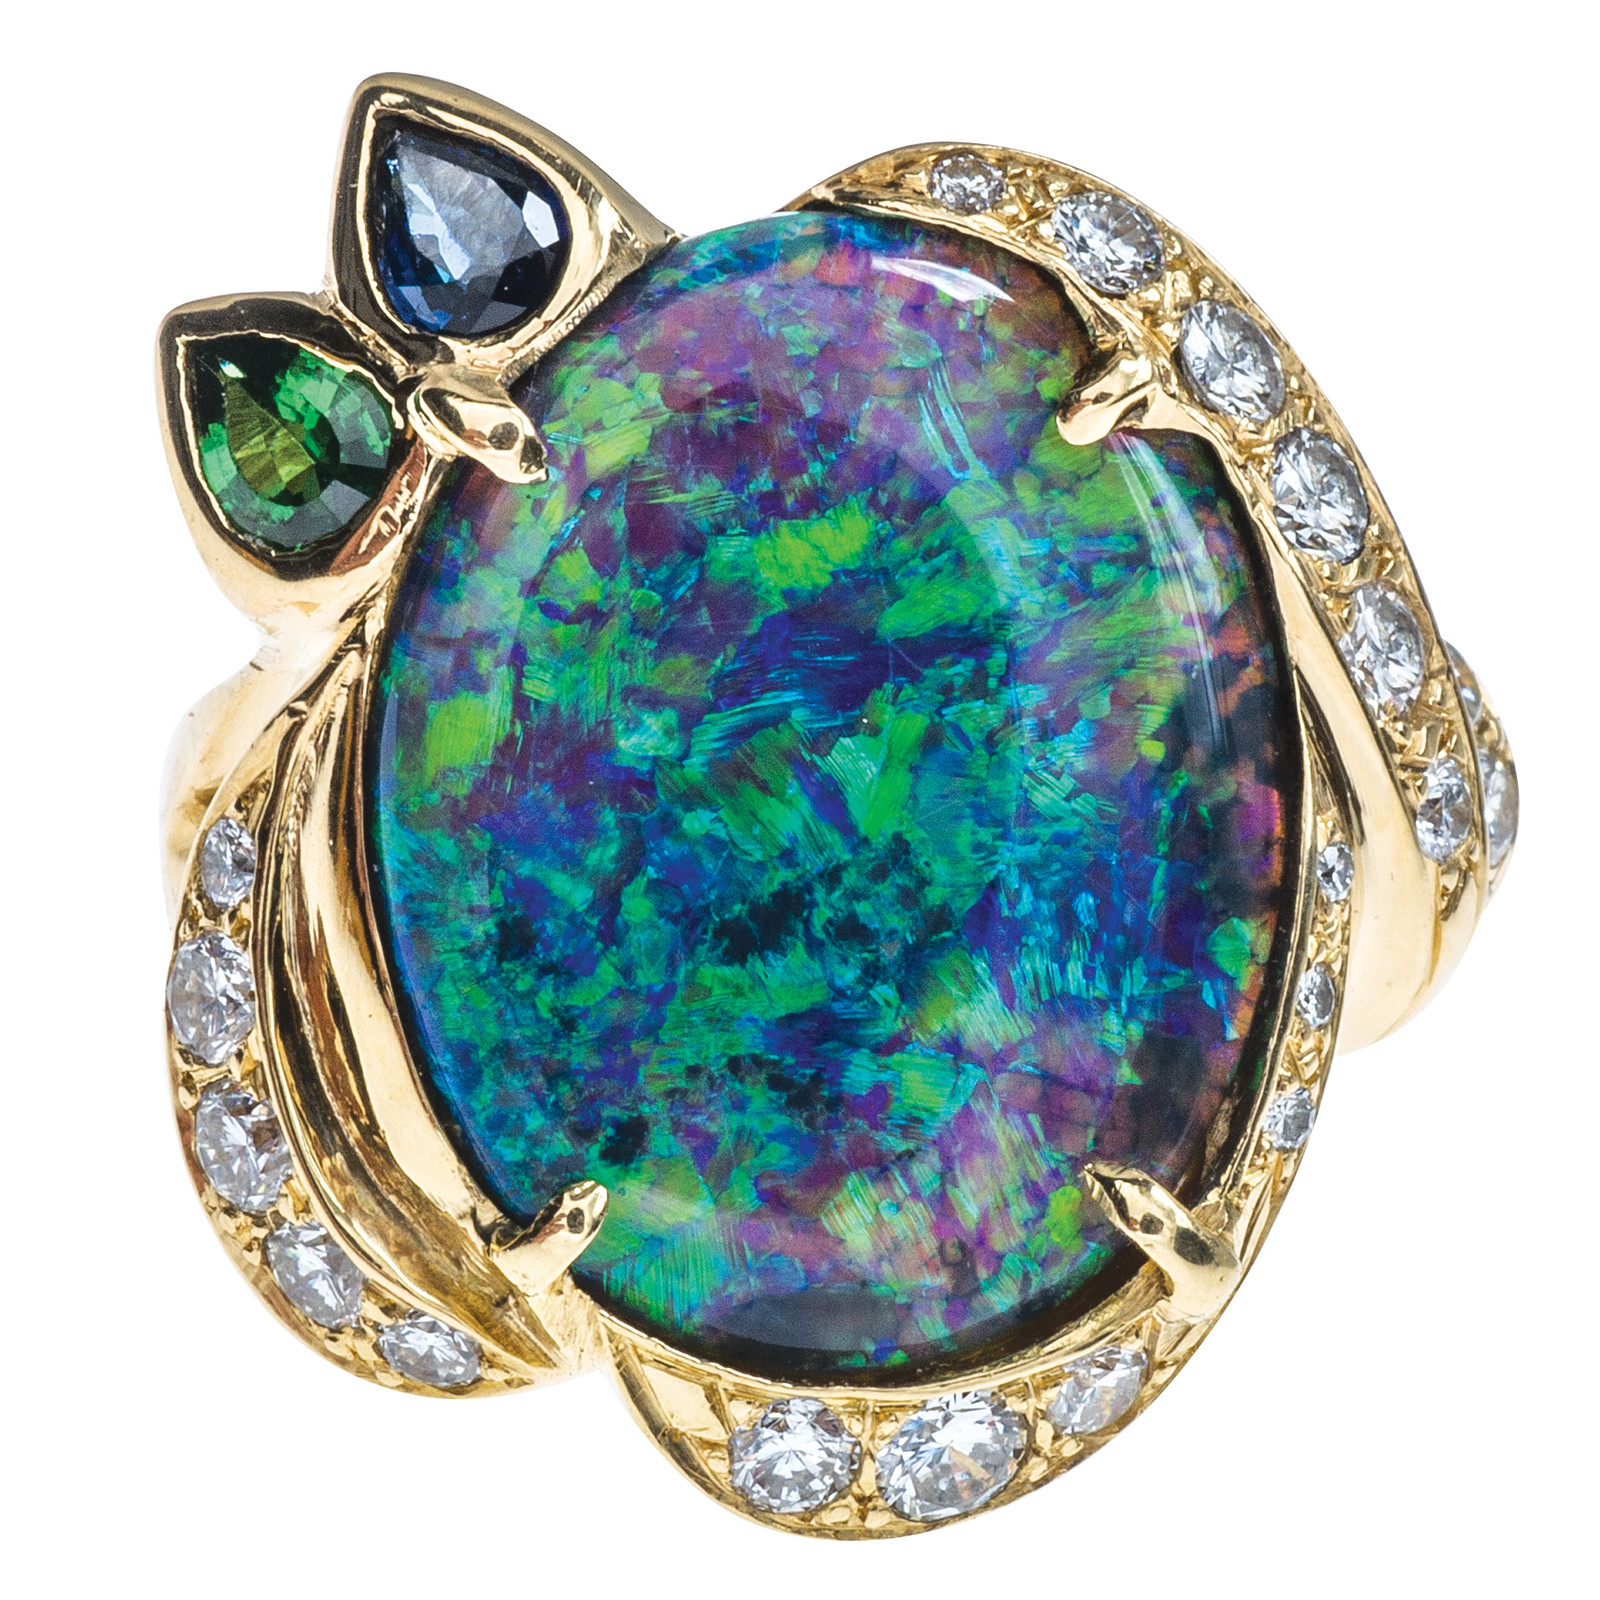 Vintage 7.75 CT Opal, Diamond, Tsavorite & Sapphire Ring